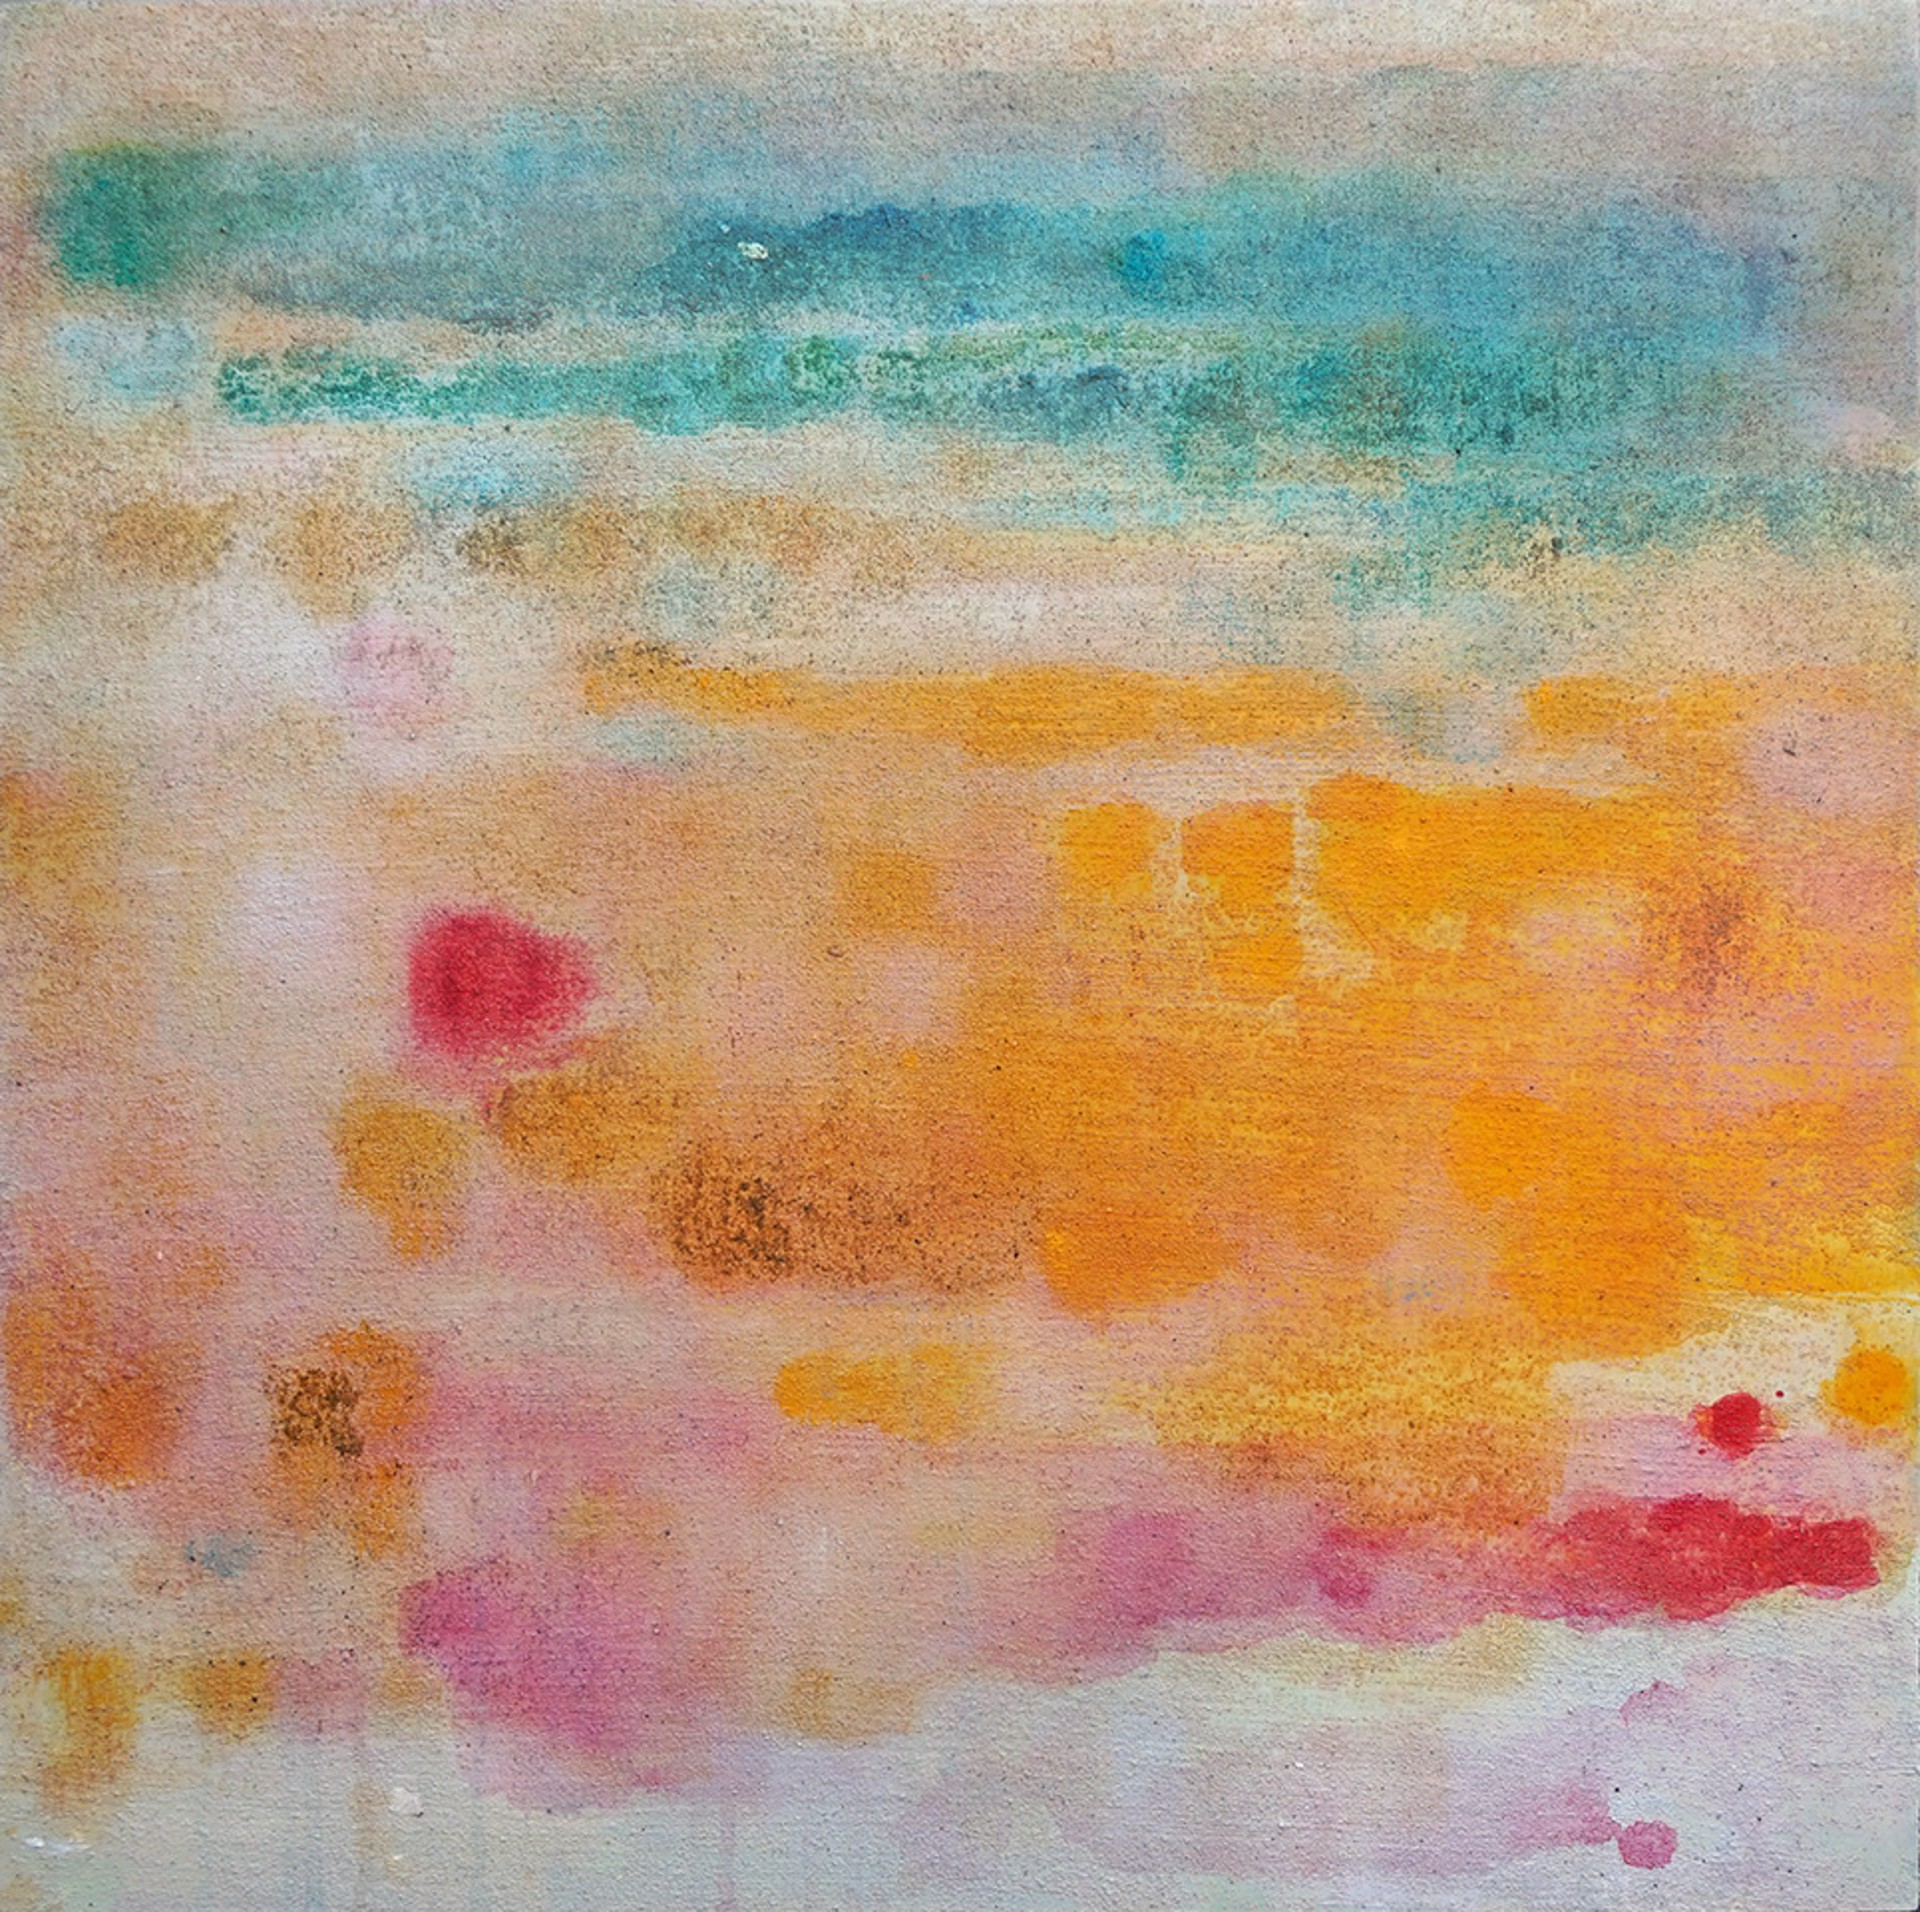 Scent of Magenta by Charlotte Bernstrom